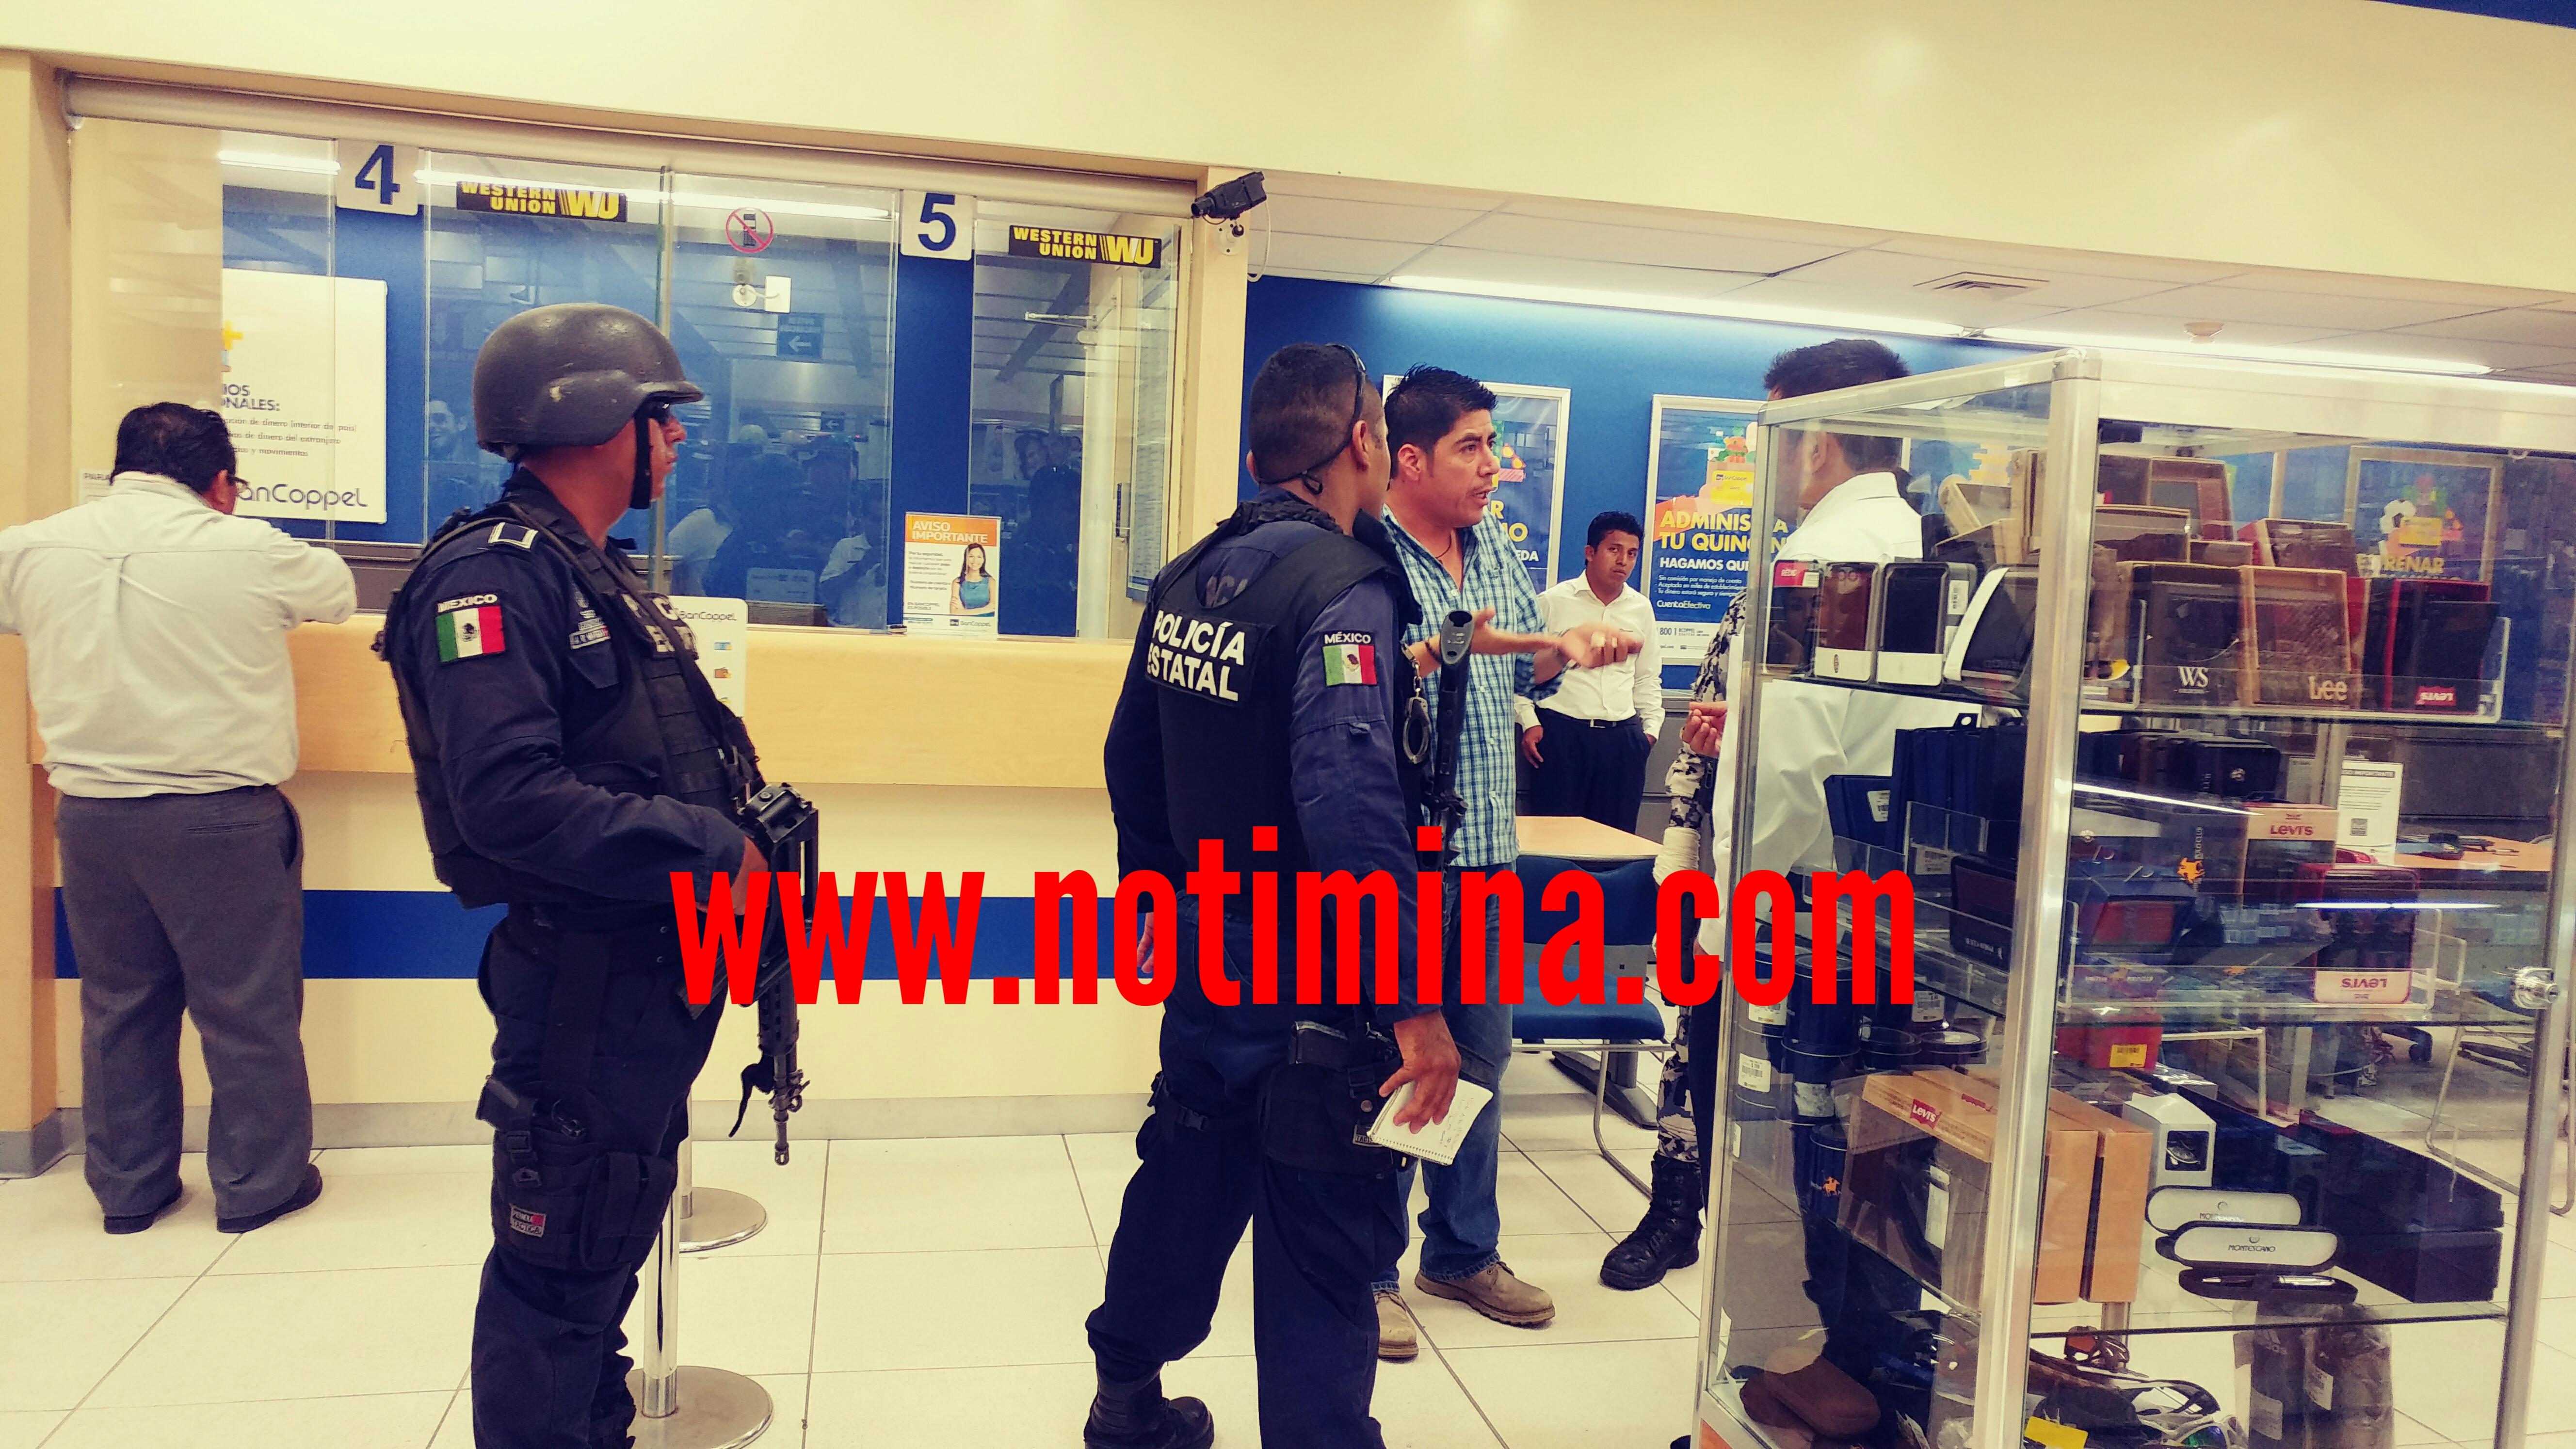 Falsa alarma de asalto a tiendas Copel del centro de Minatitlán